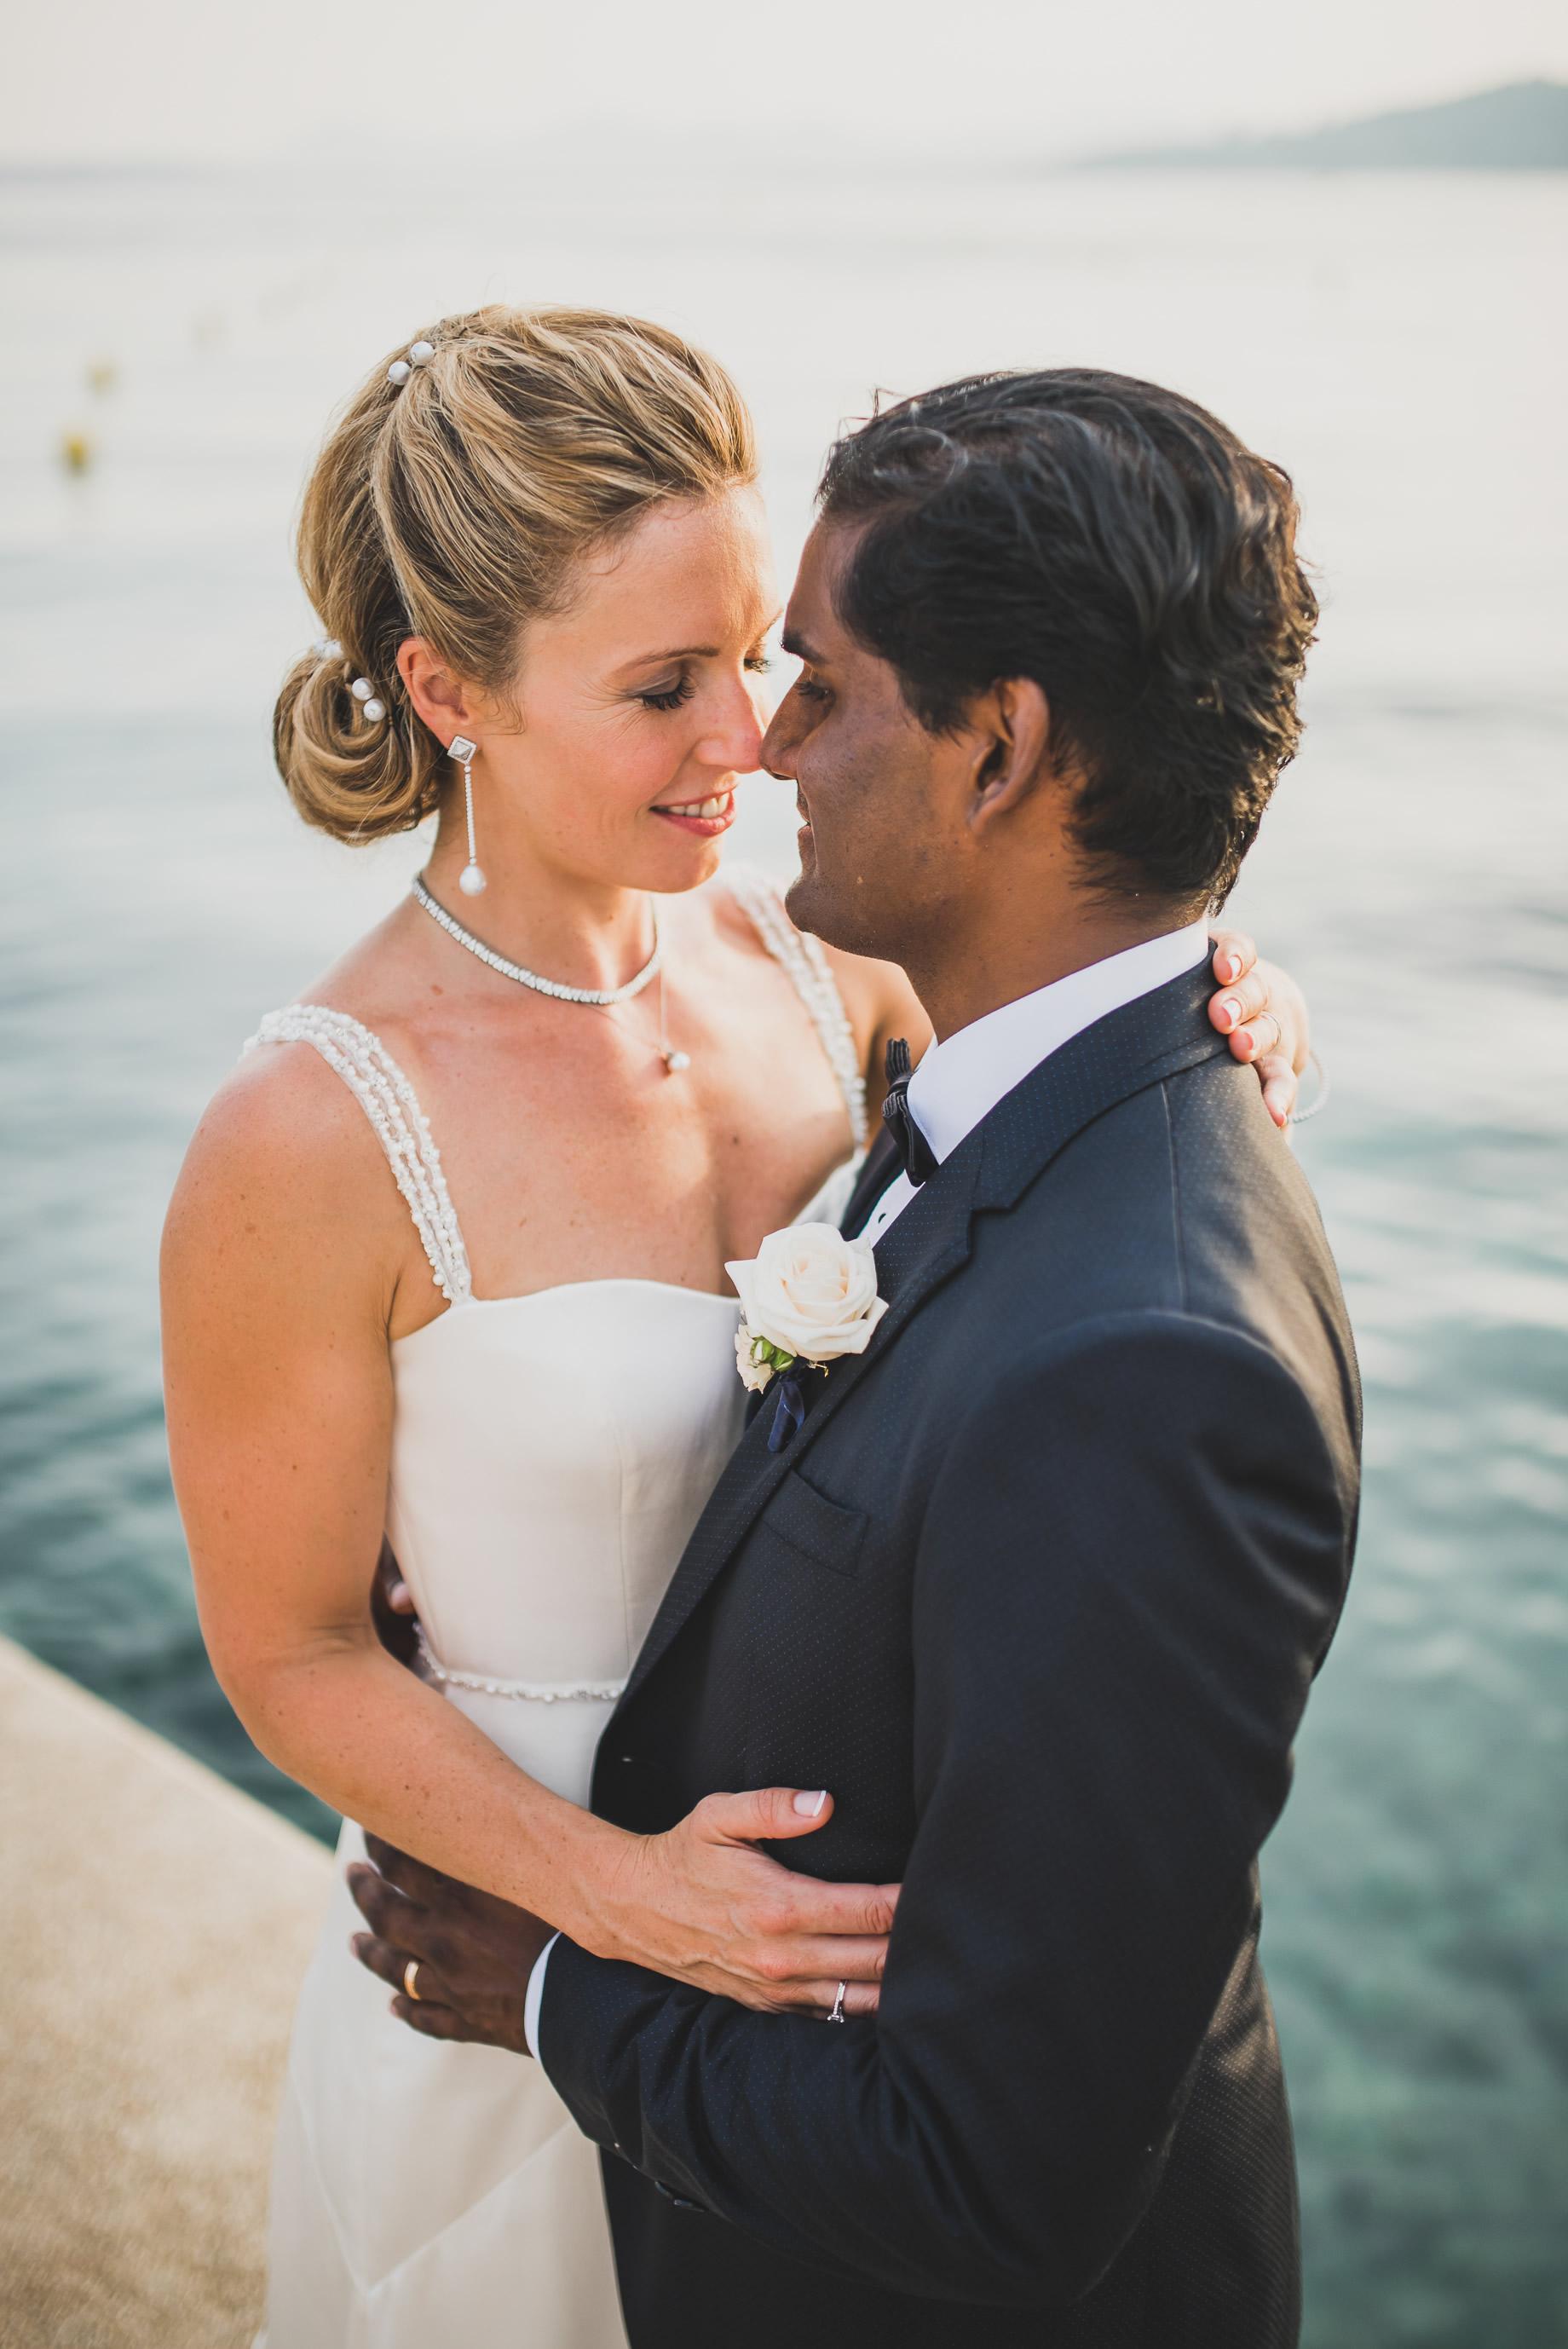 Jen and Priyan's Wedding - A Preview 009